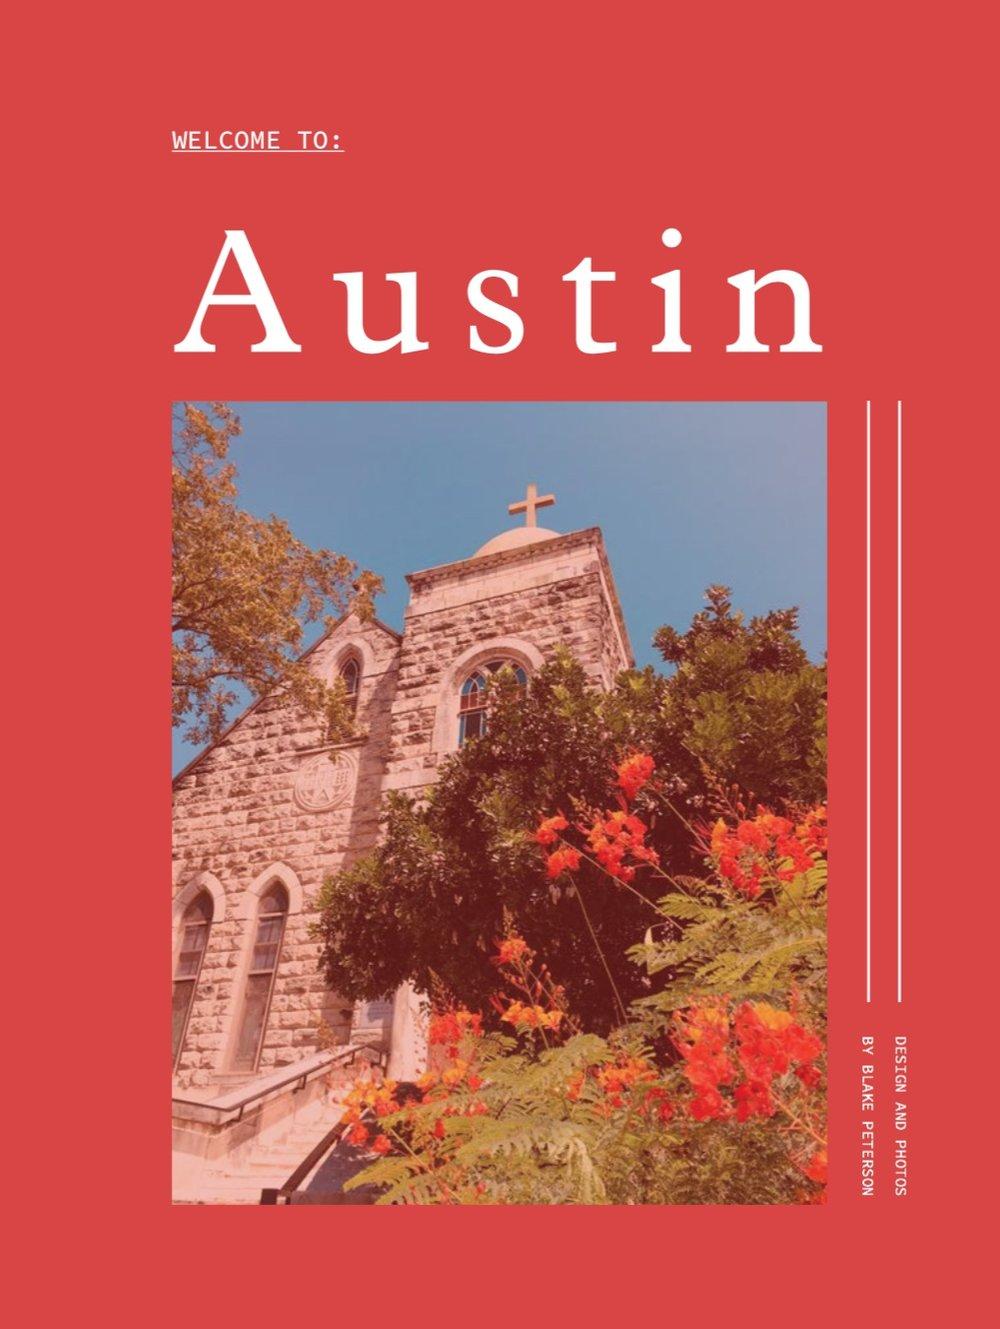 AUSTIN TRAVEL GUIDEINTERACTIVE PDF - E-DESIGN & PUBLISHING